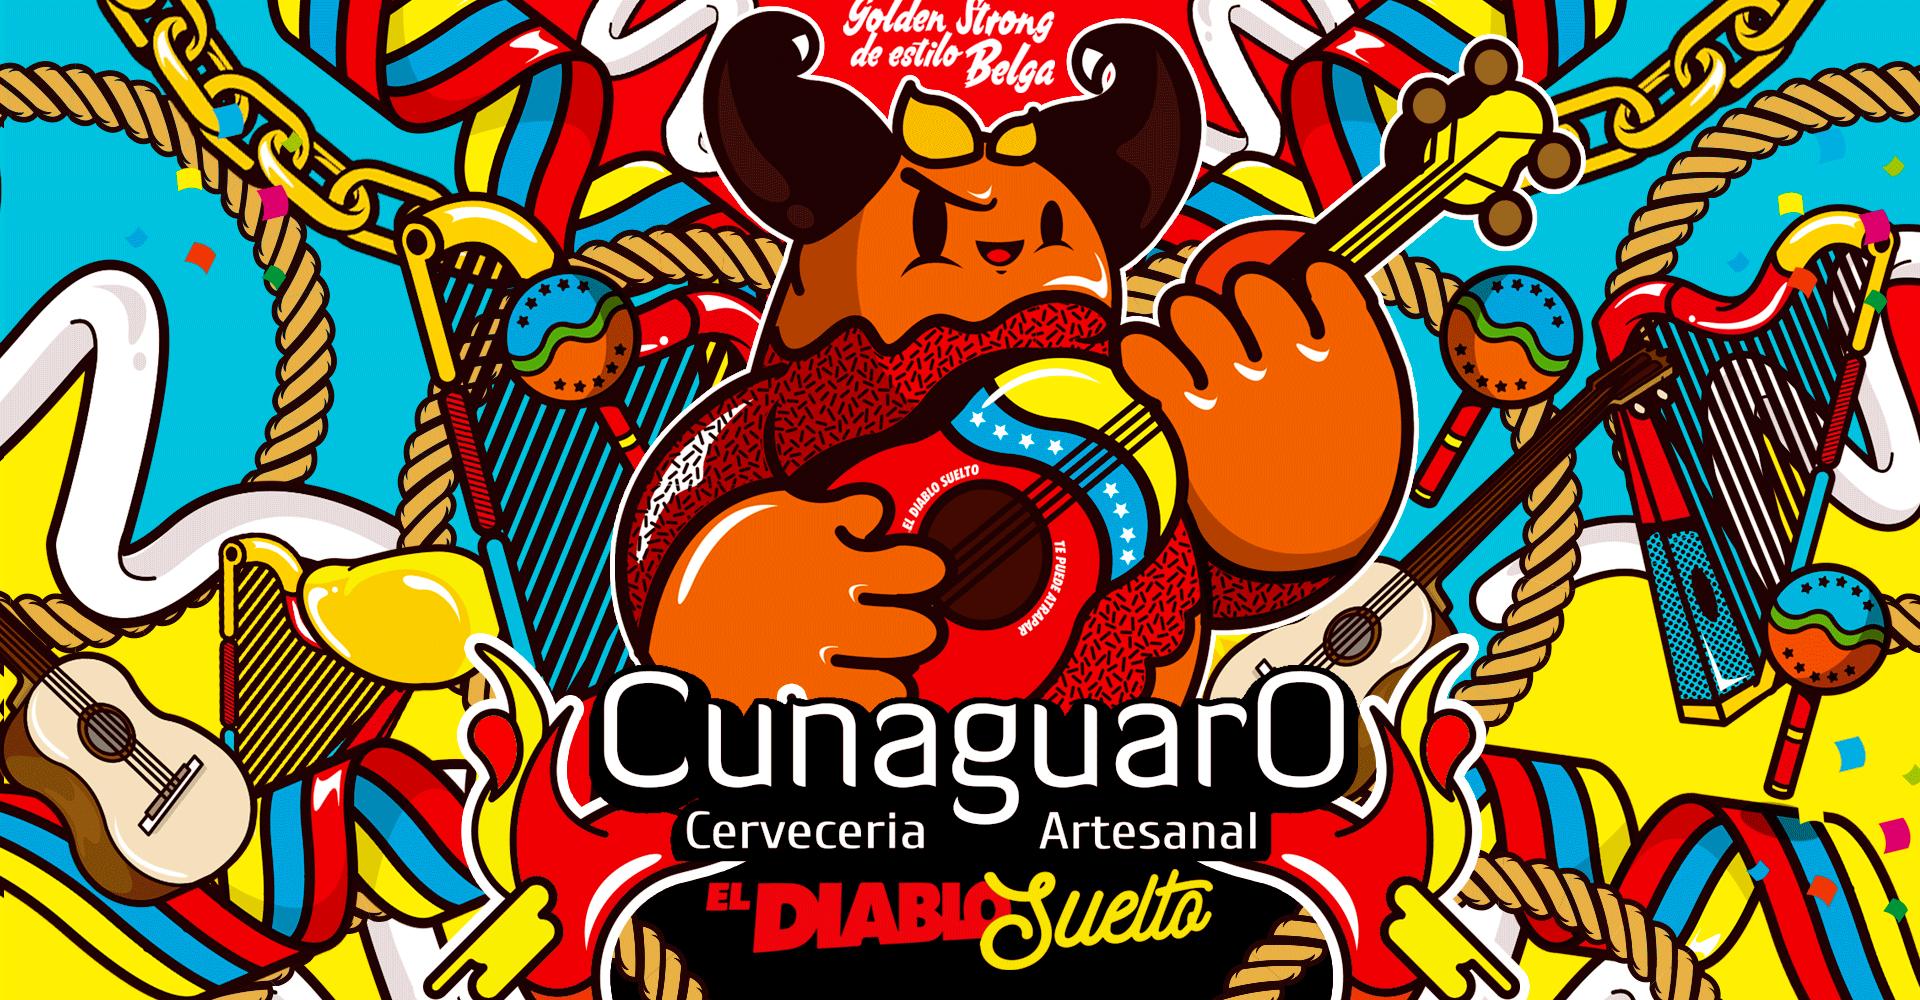 cunaguaro-beer-chocotoy-2.png